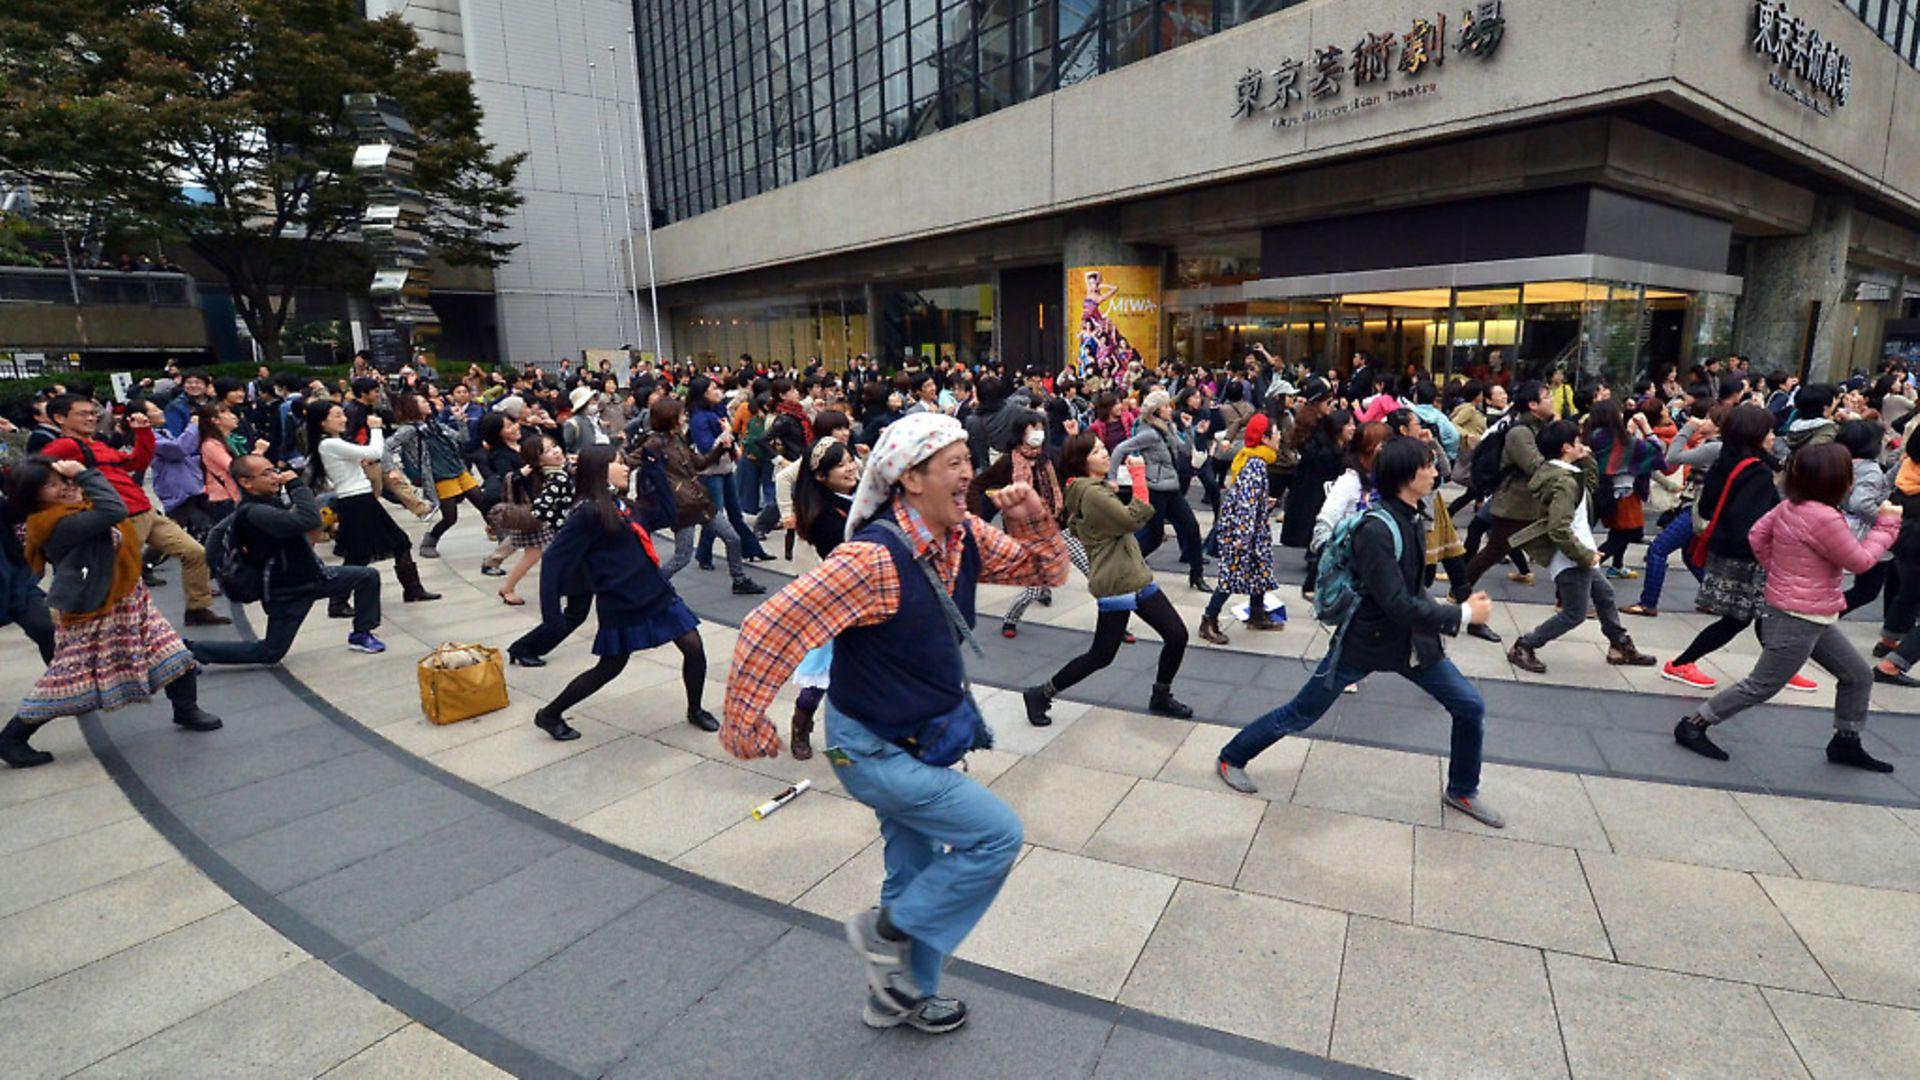 "People dance Yellow Magic Orchestra's (YMO) ""Rydeen"" in a flashmob event coreographed by Ryohei Kondo in Tokyo. (Photo YOSHIKAZU TSUNO/AFP via Getty Images) - Credit: AFP via Getty Images"